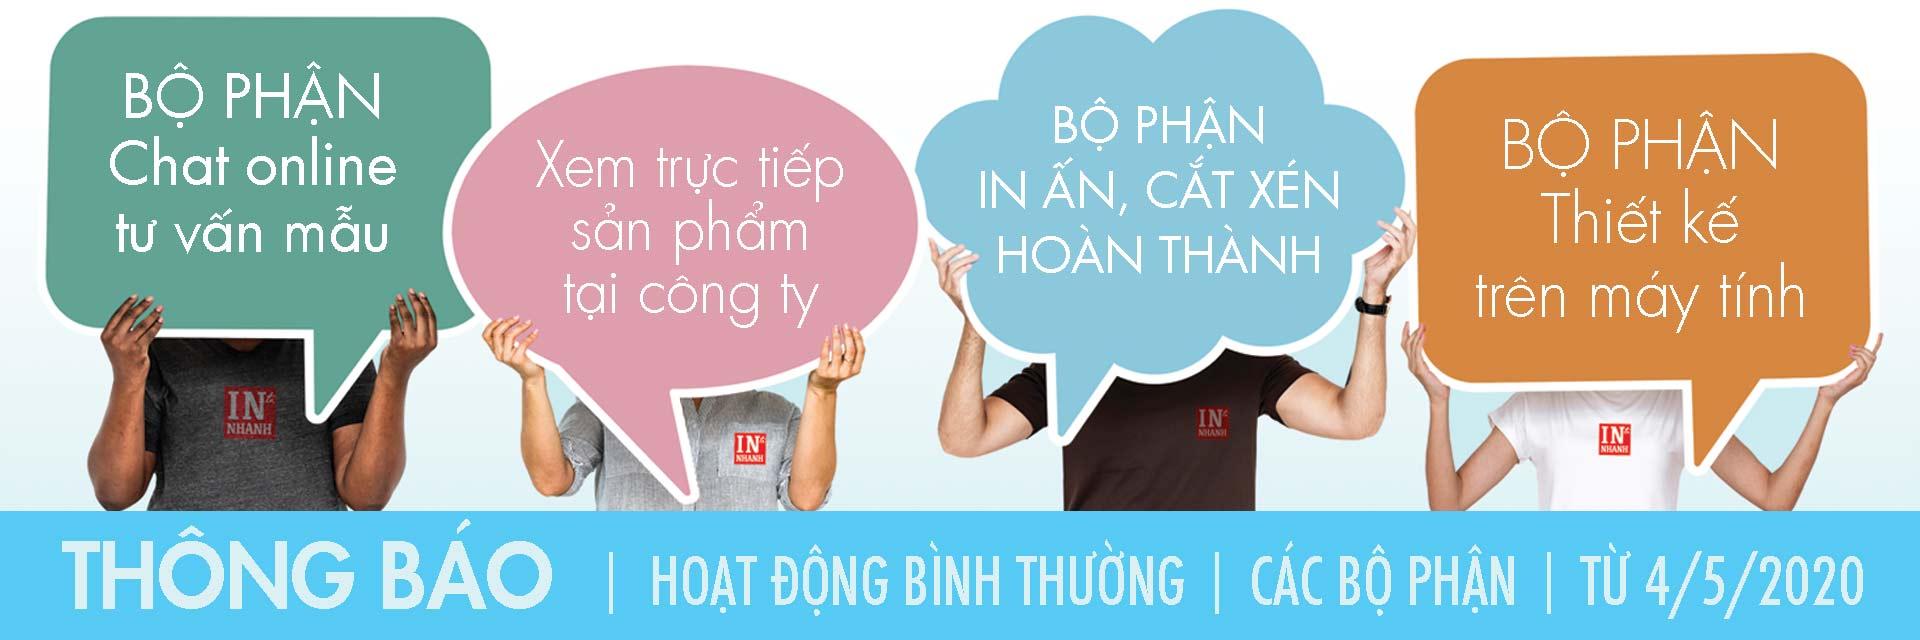 THONG-BAO-WEB